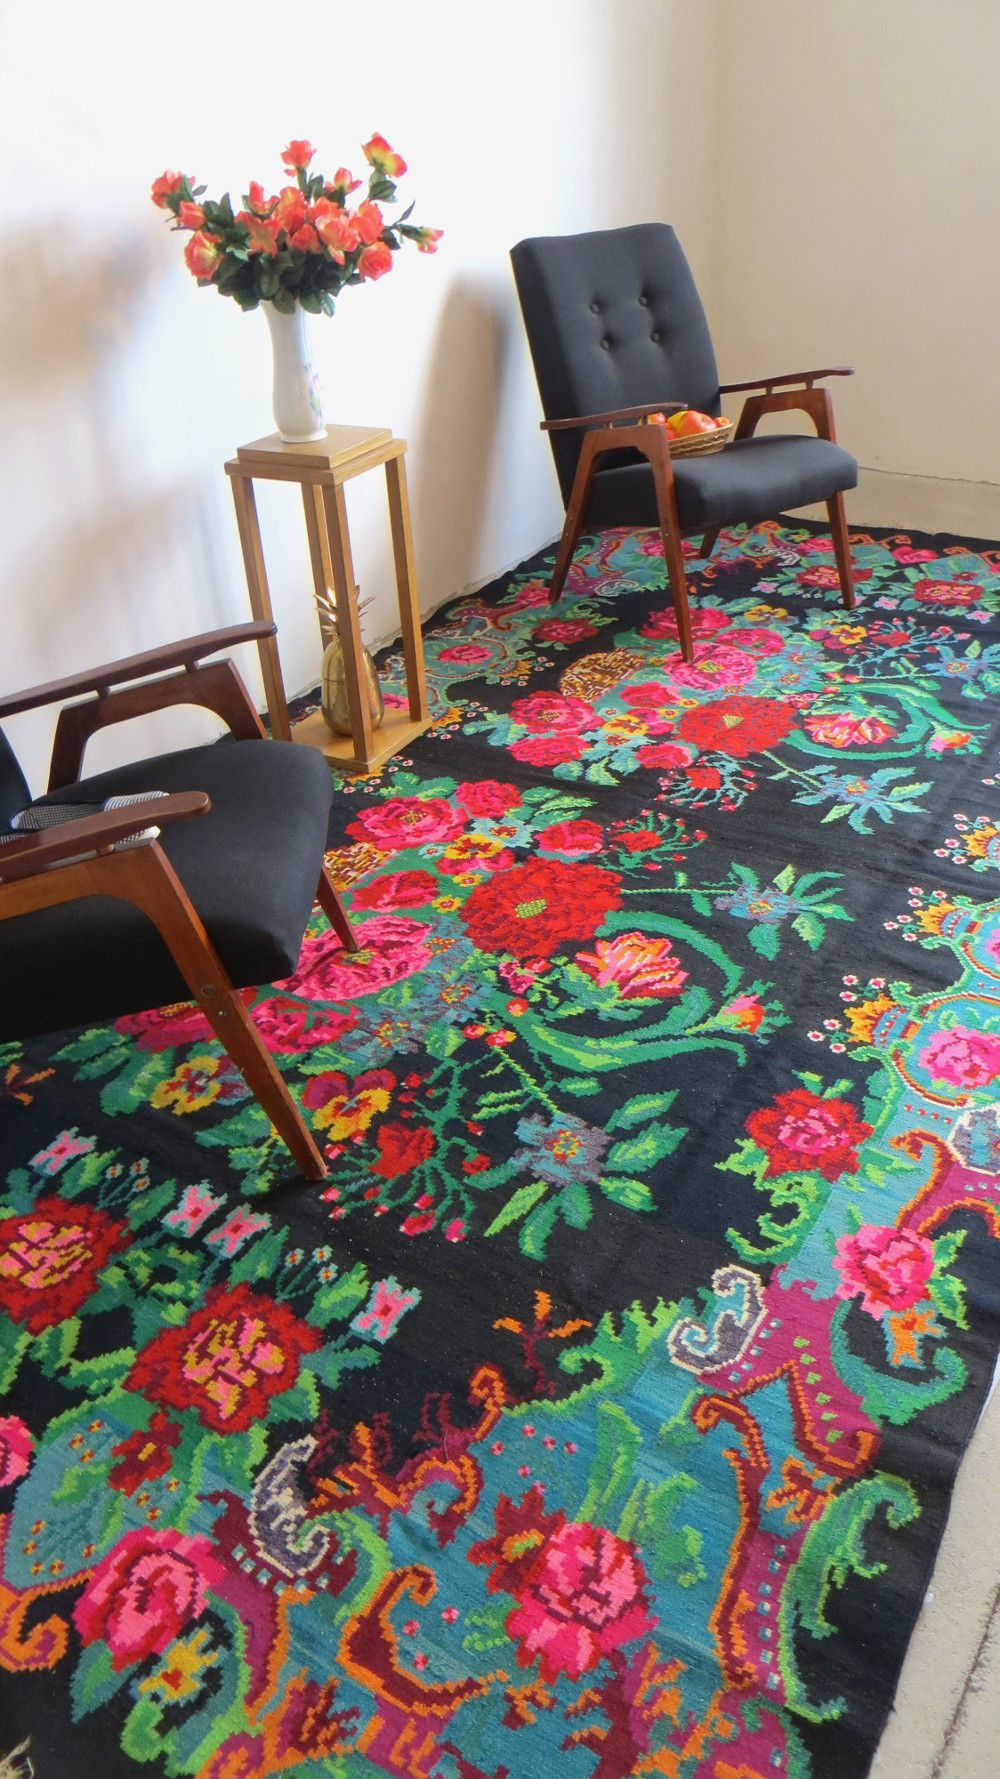 grand tapis de salon tapis kilim moldave large area rug. Black Bedroom Furniture Sets. Home Design Ideas